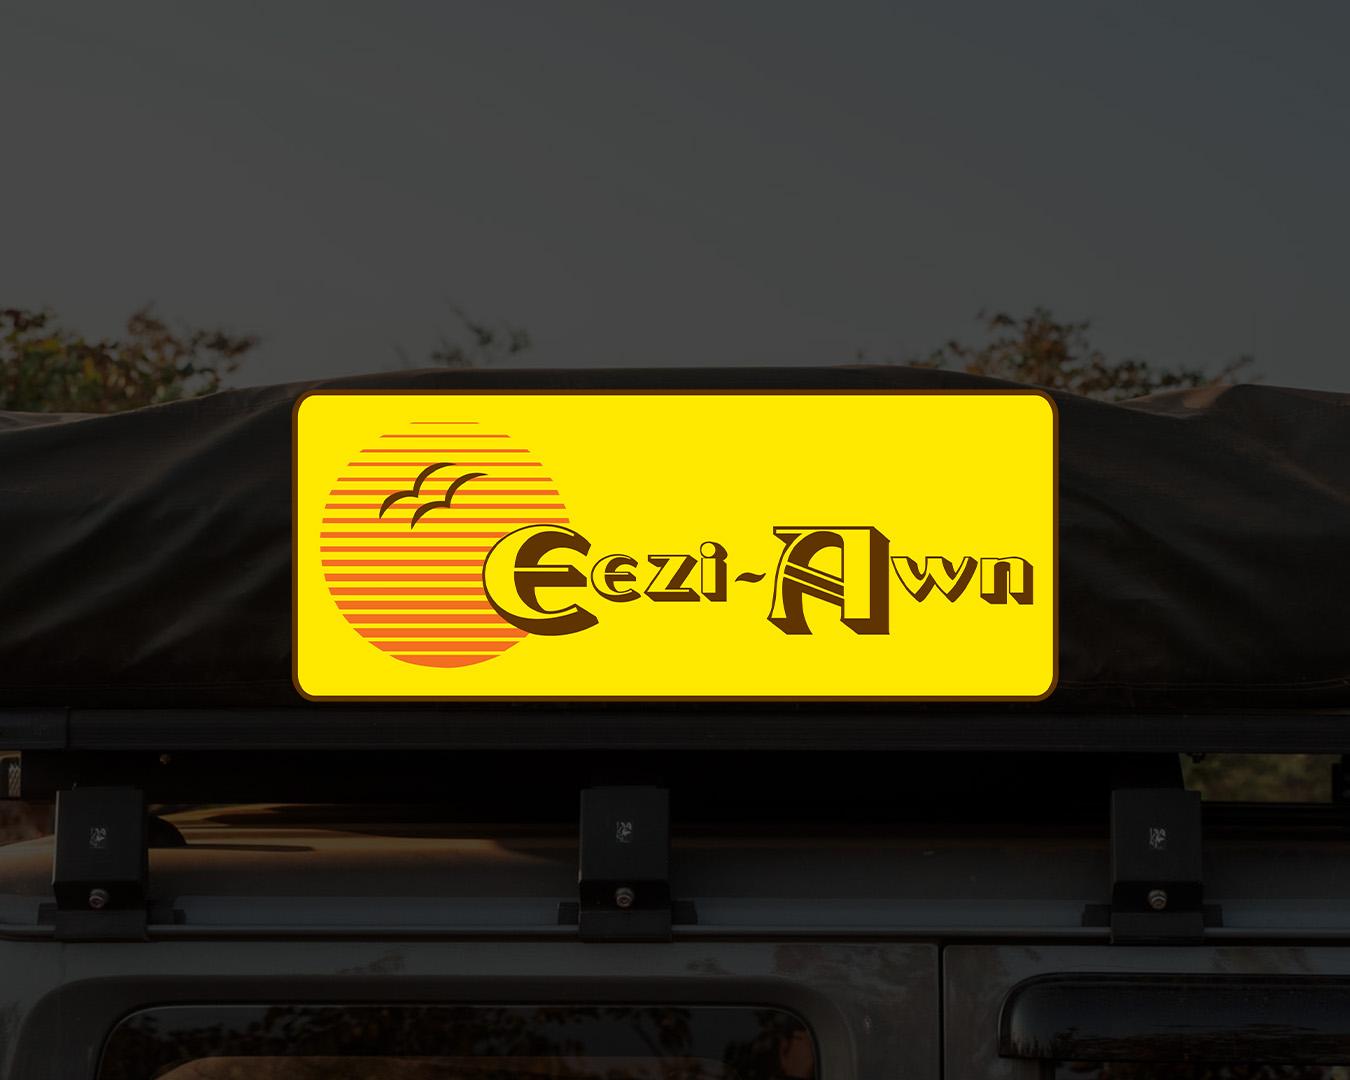 Eeziawn